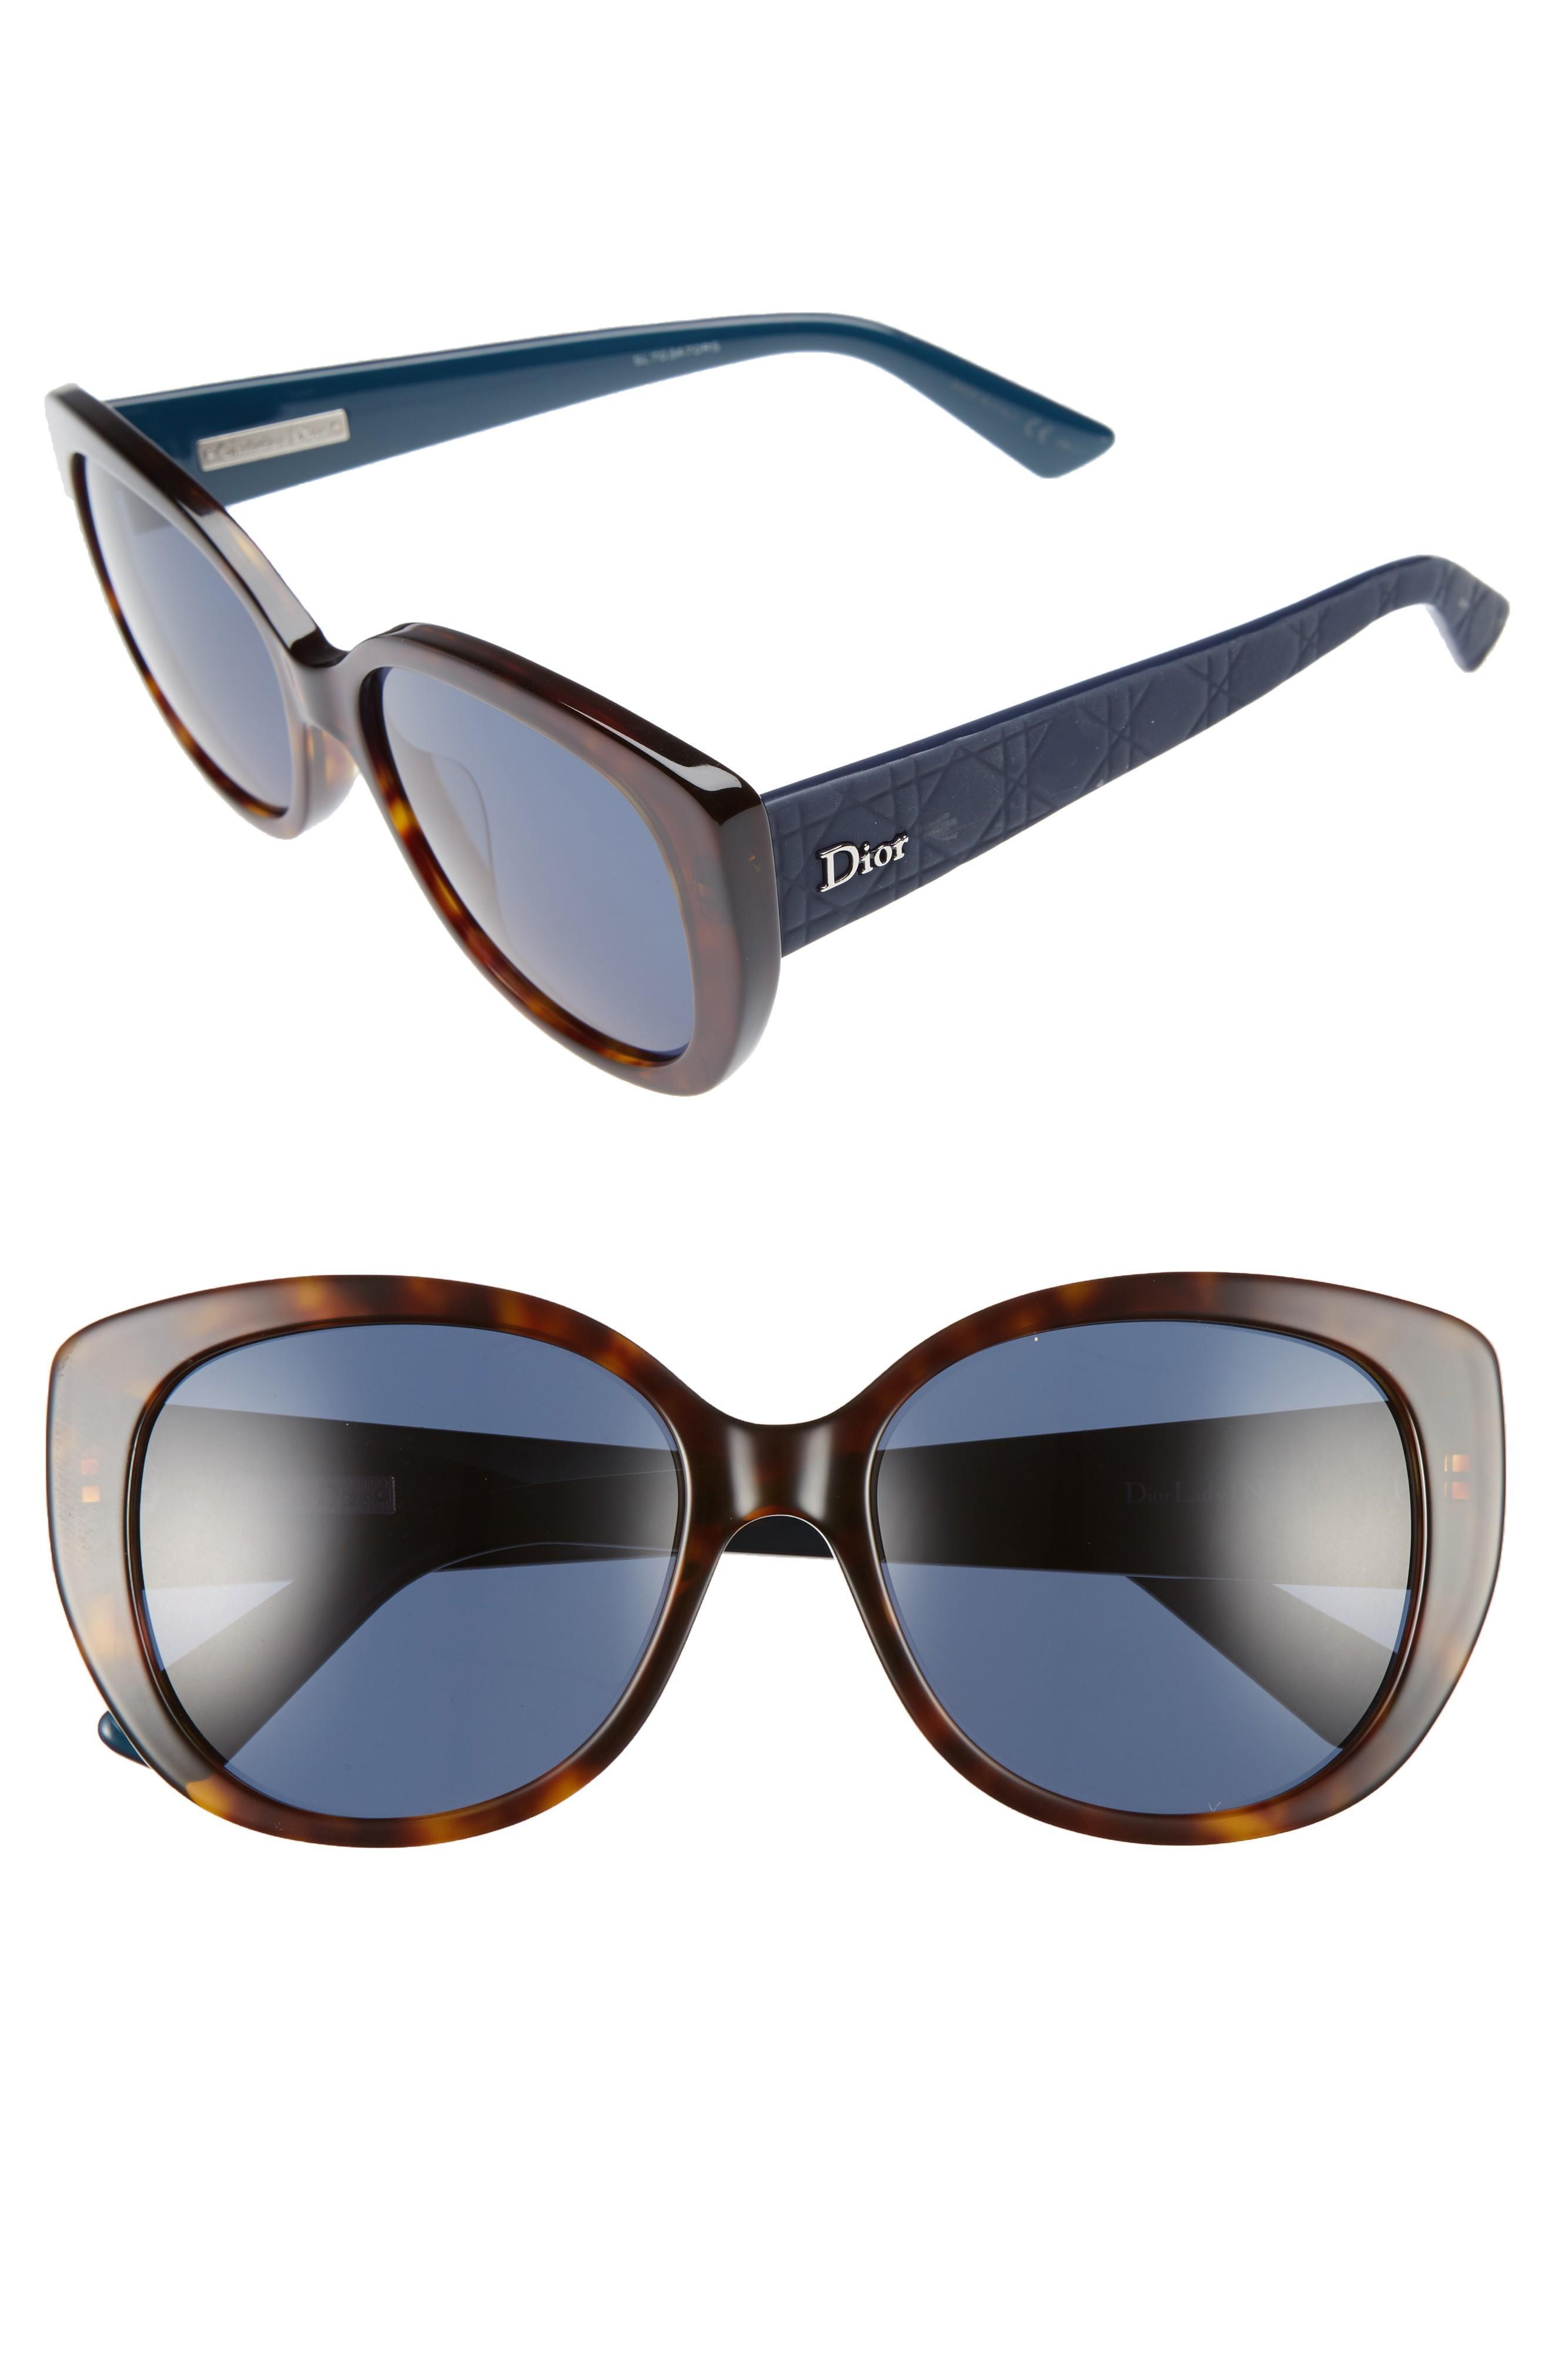 c17ece977949 Dior Lady 55Mm Cat Eye Sunglasses - Havana  Blue